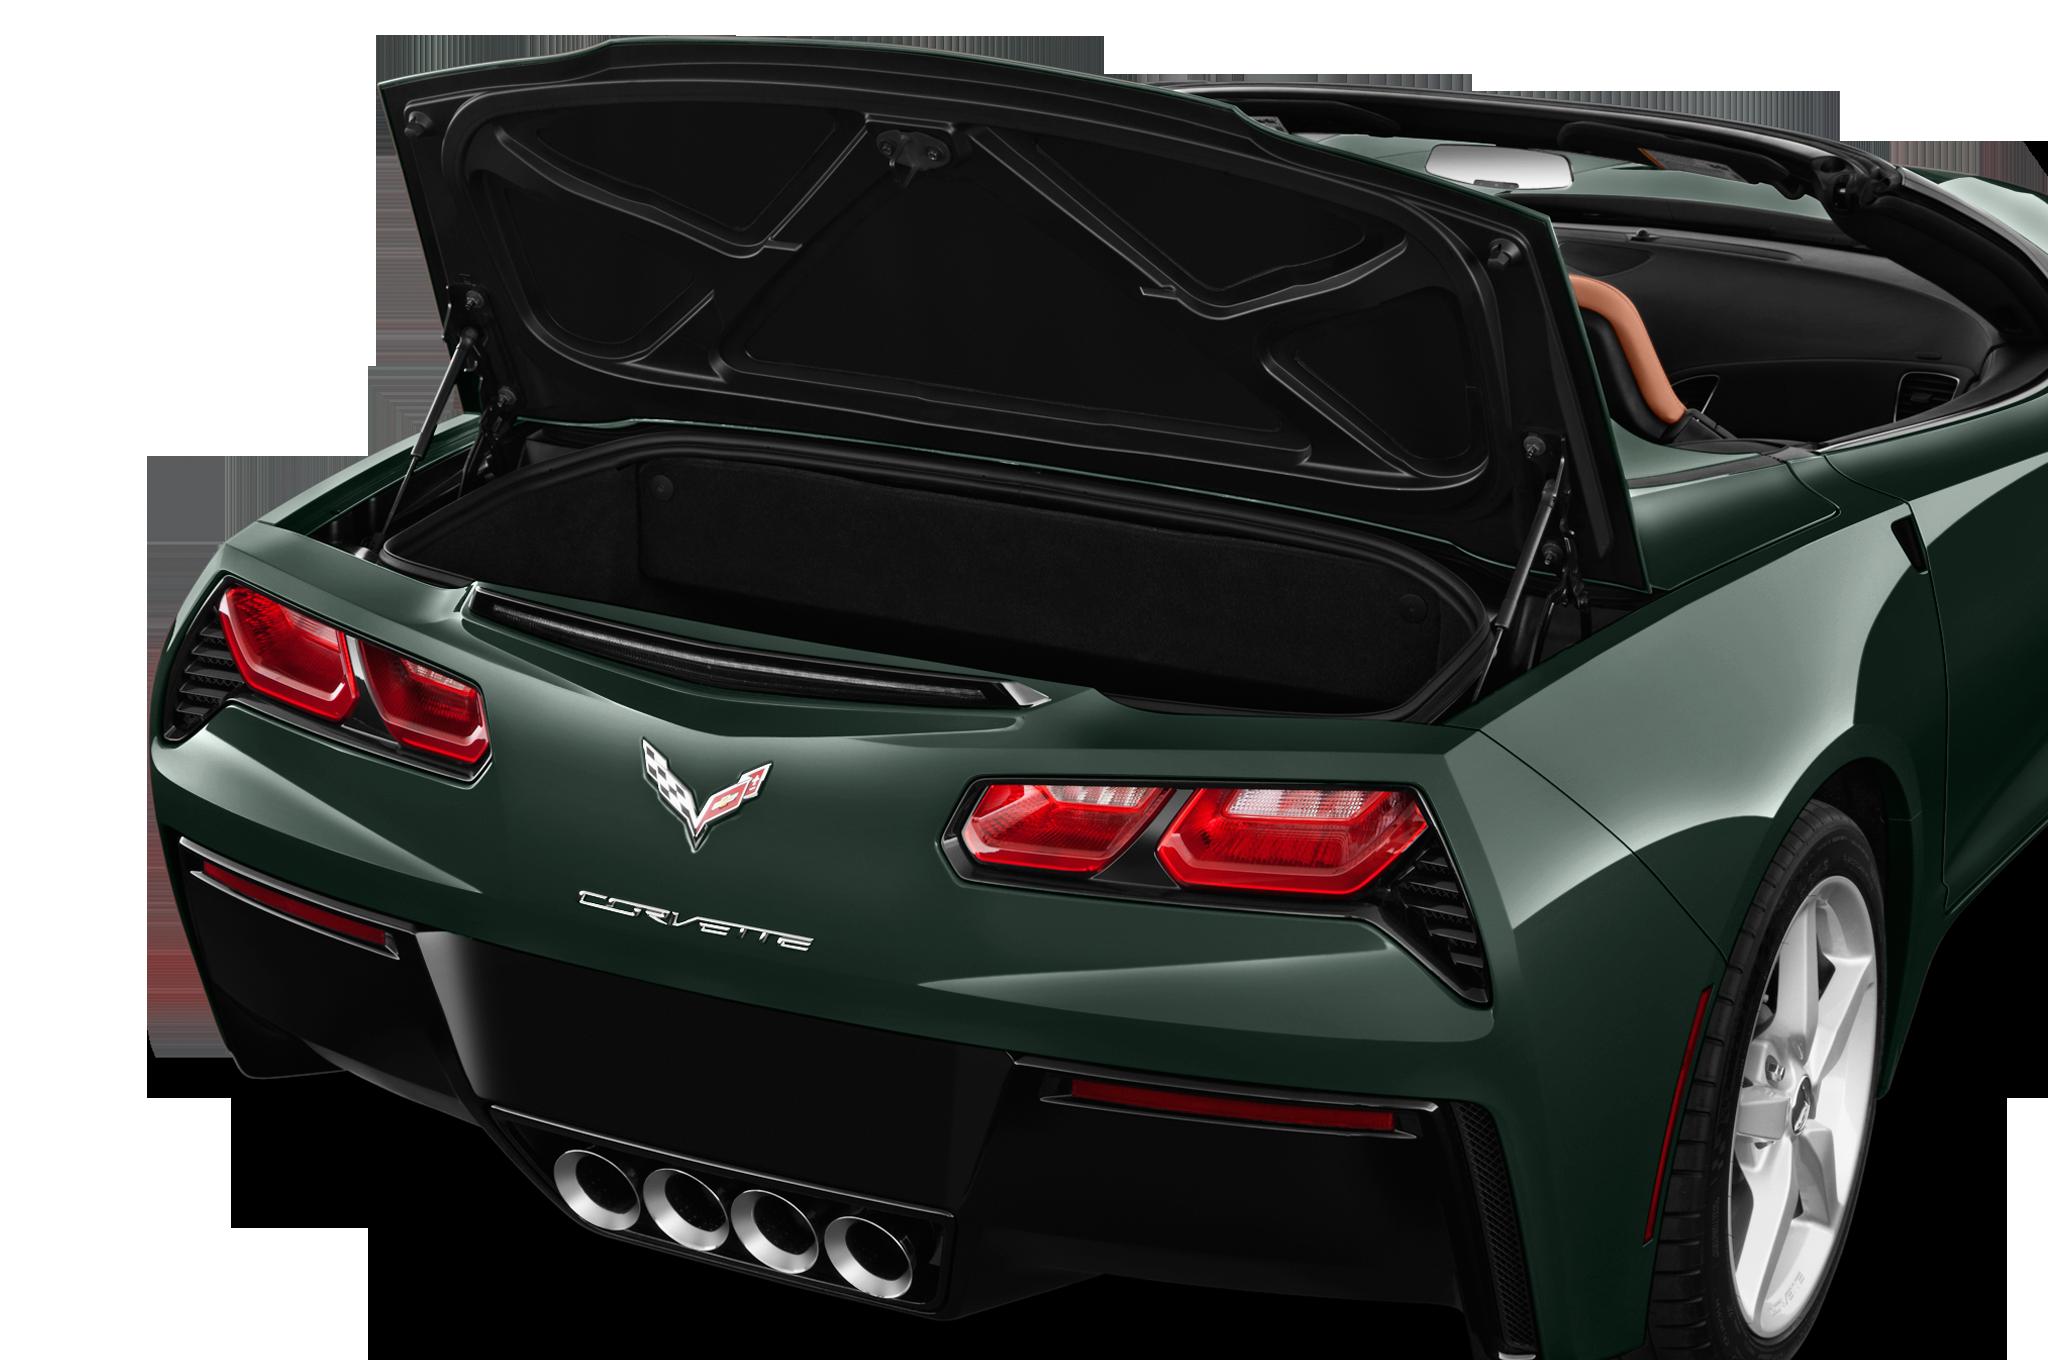 2017 Chevrolet Corvette Grand Sport Bridges C7 Stingray ...